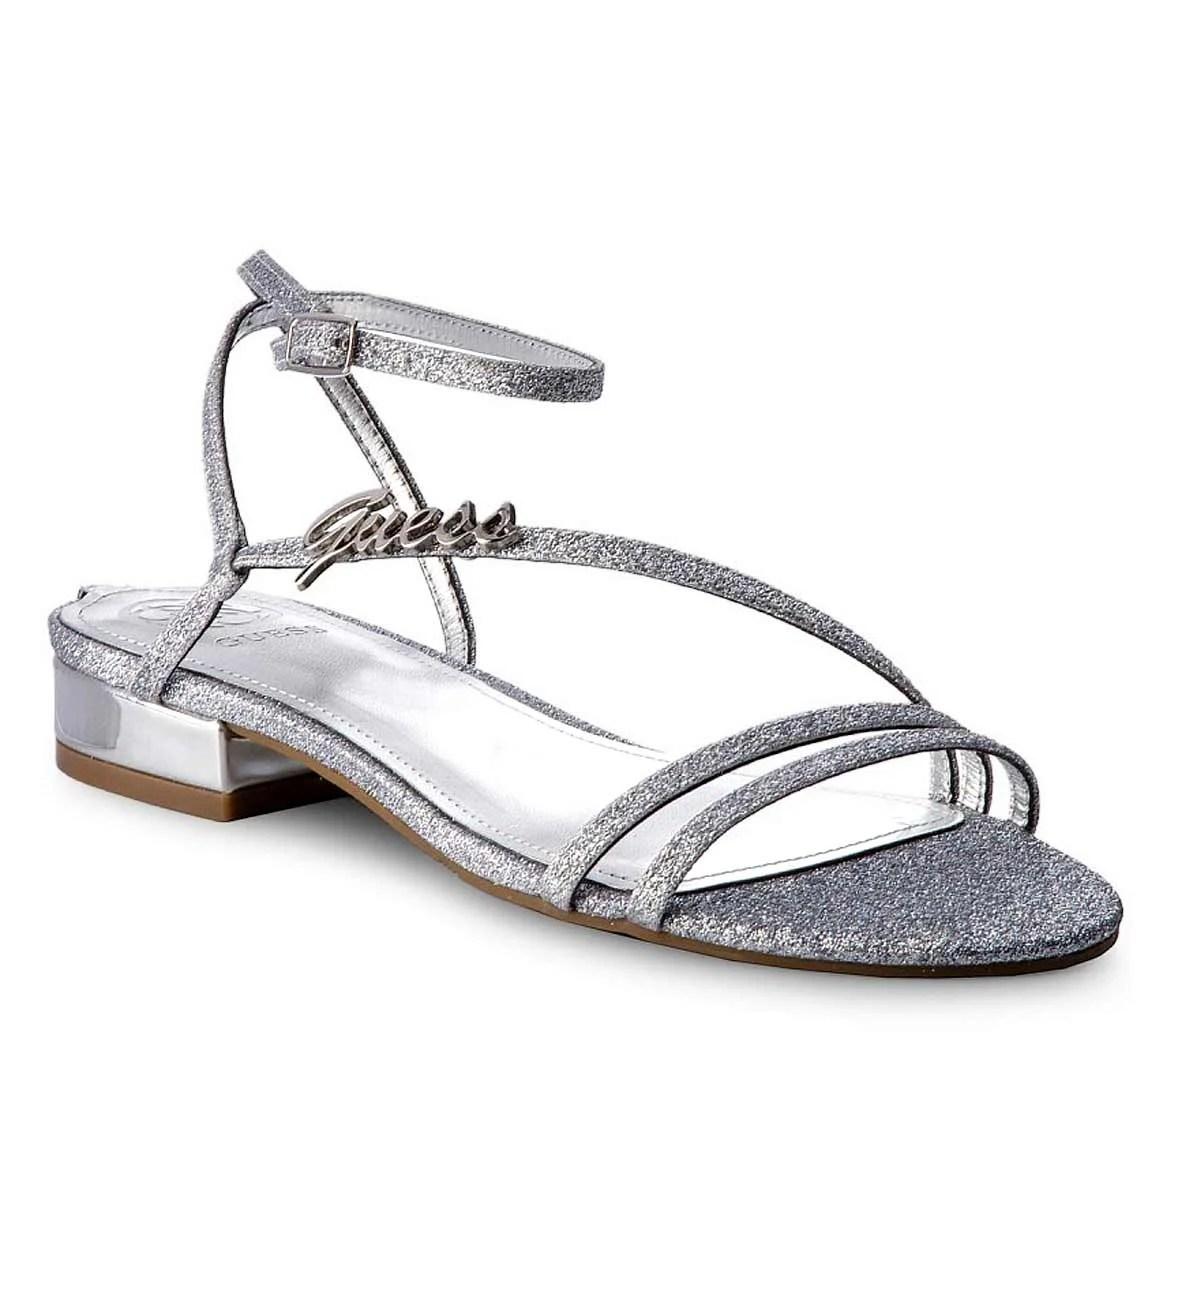 993.044 GUESS Damen Marken-Sandalette Silberfarben